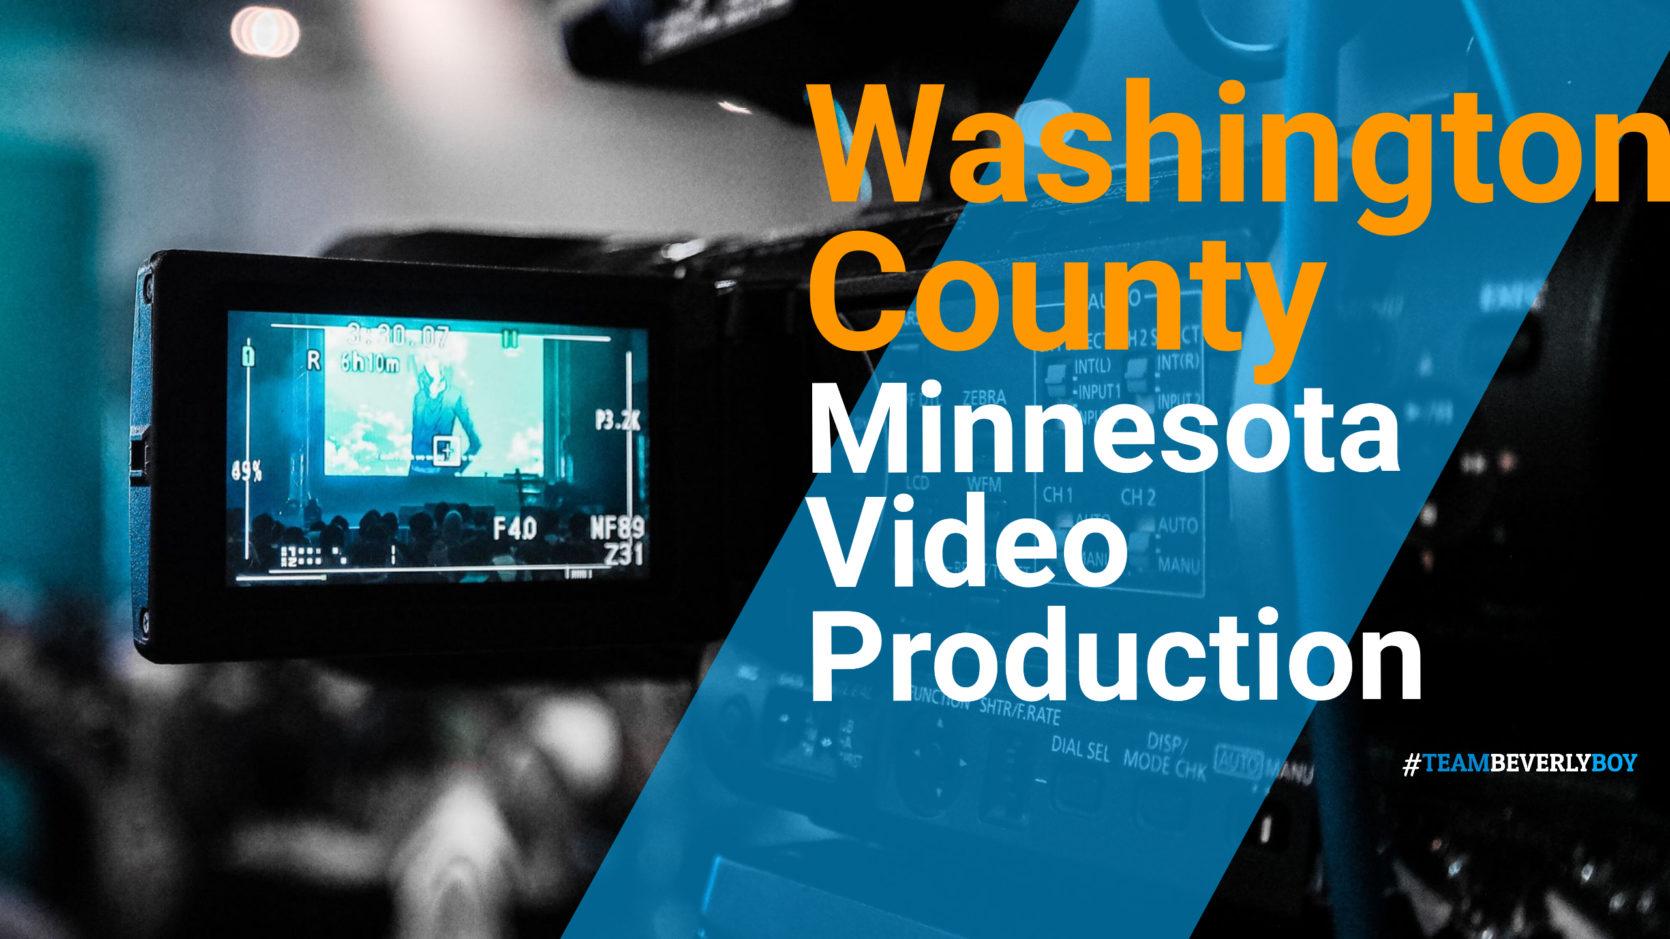 Washington county MN Video Production